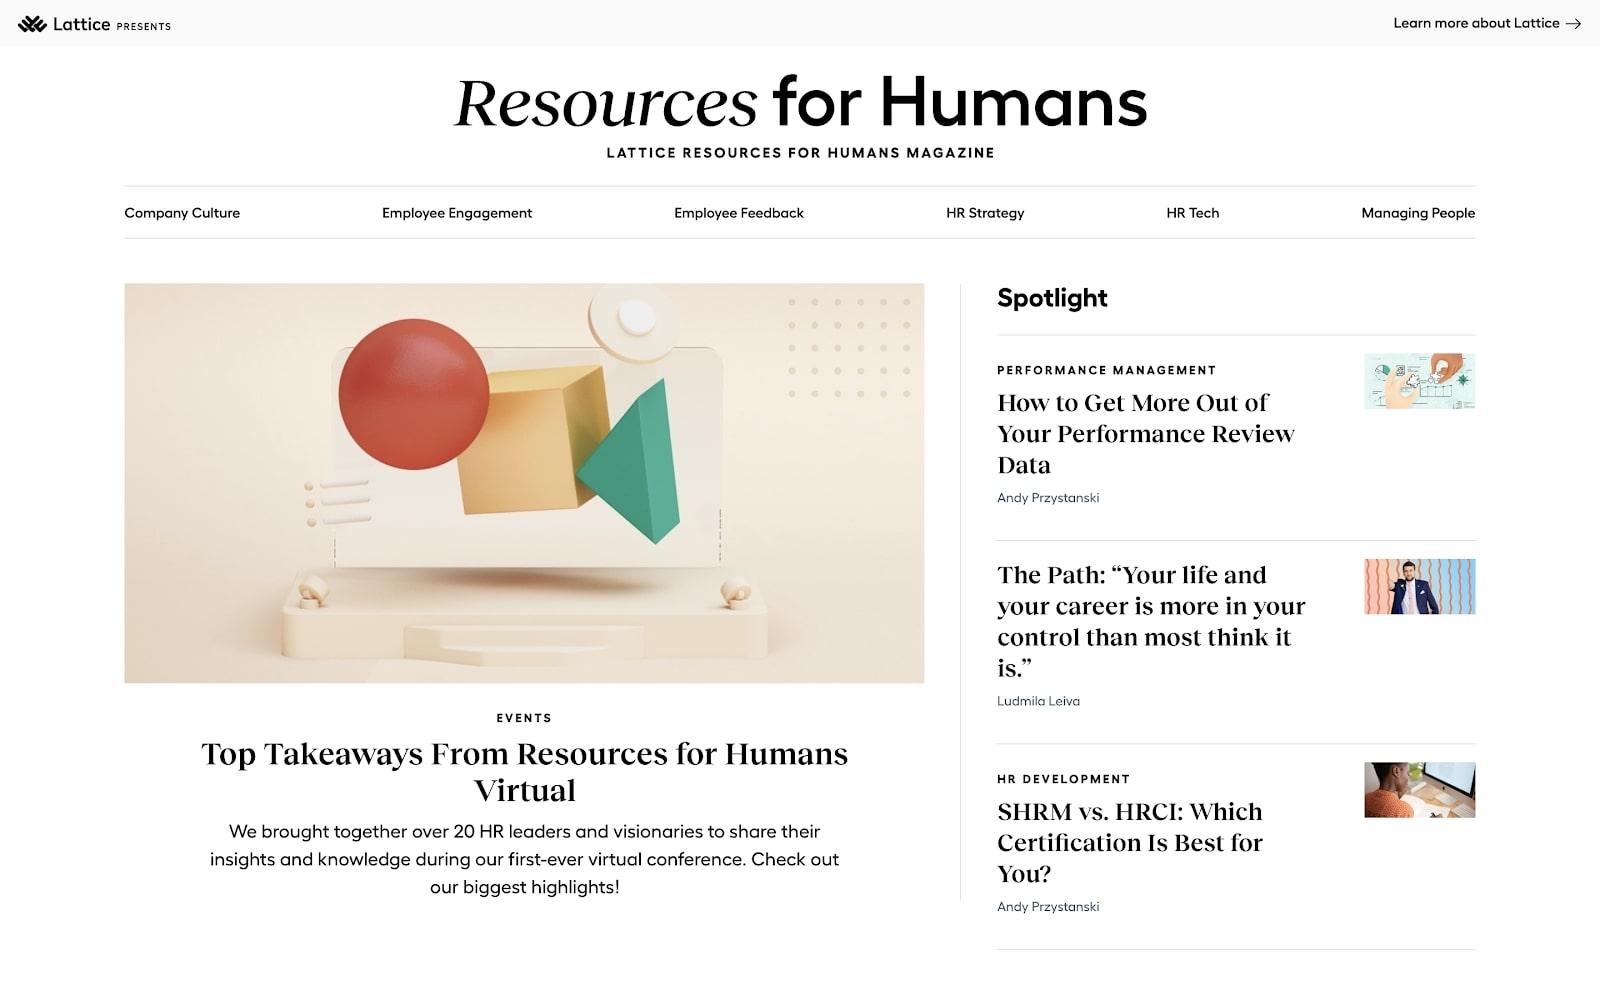 lattice's resources for humans magazine